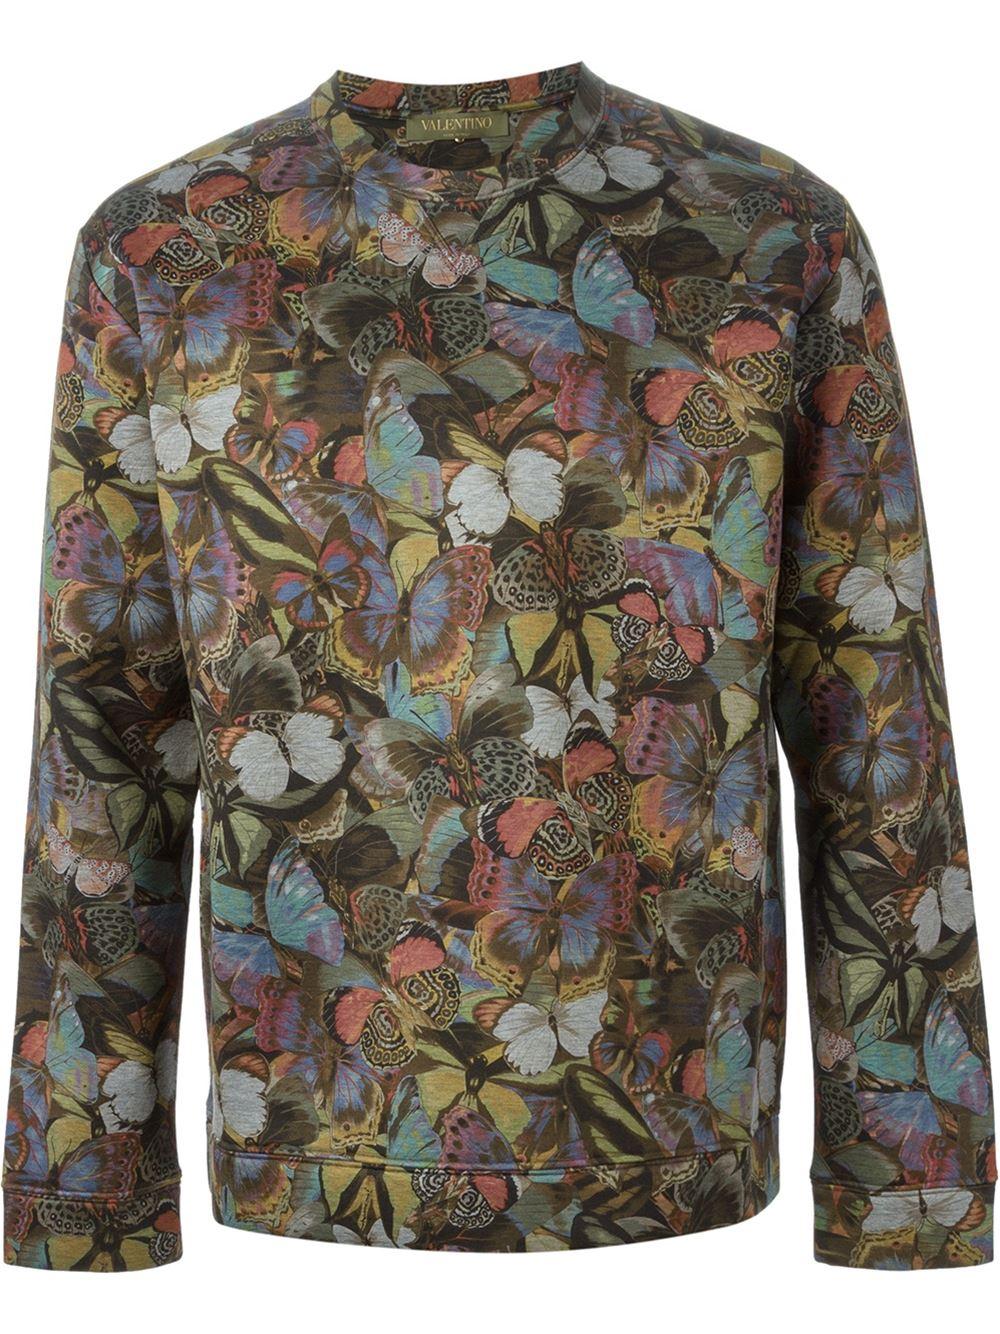 valentino-rockstud-butterfly-print-sweatshirt-2